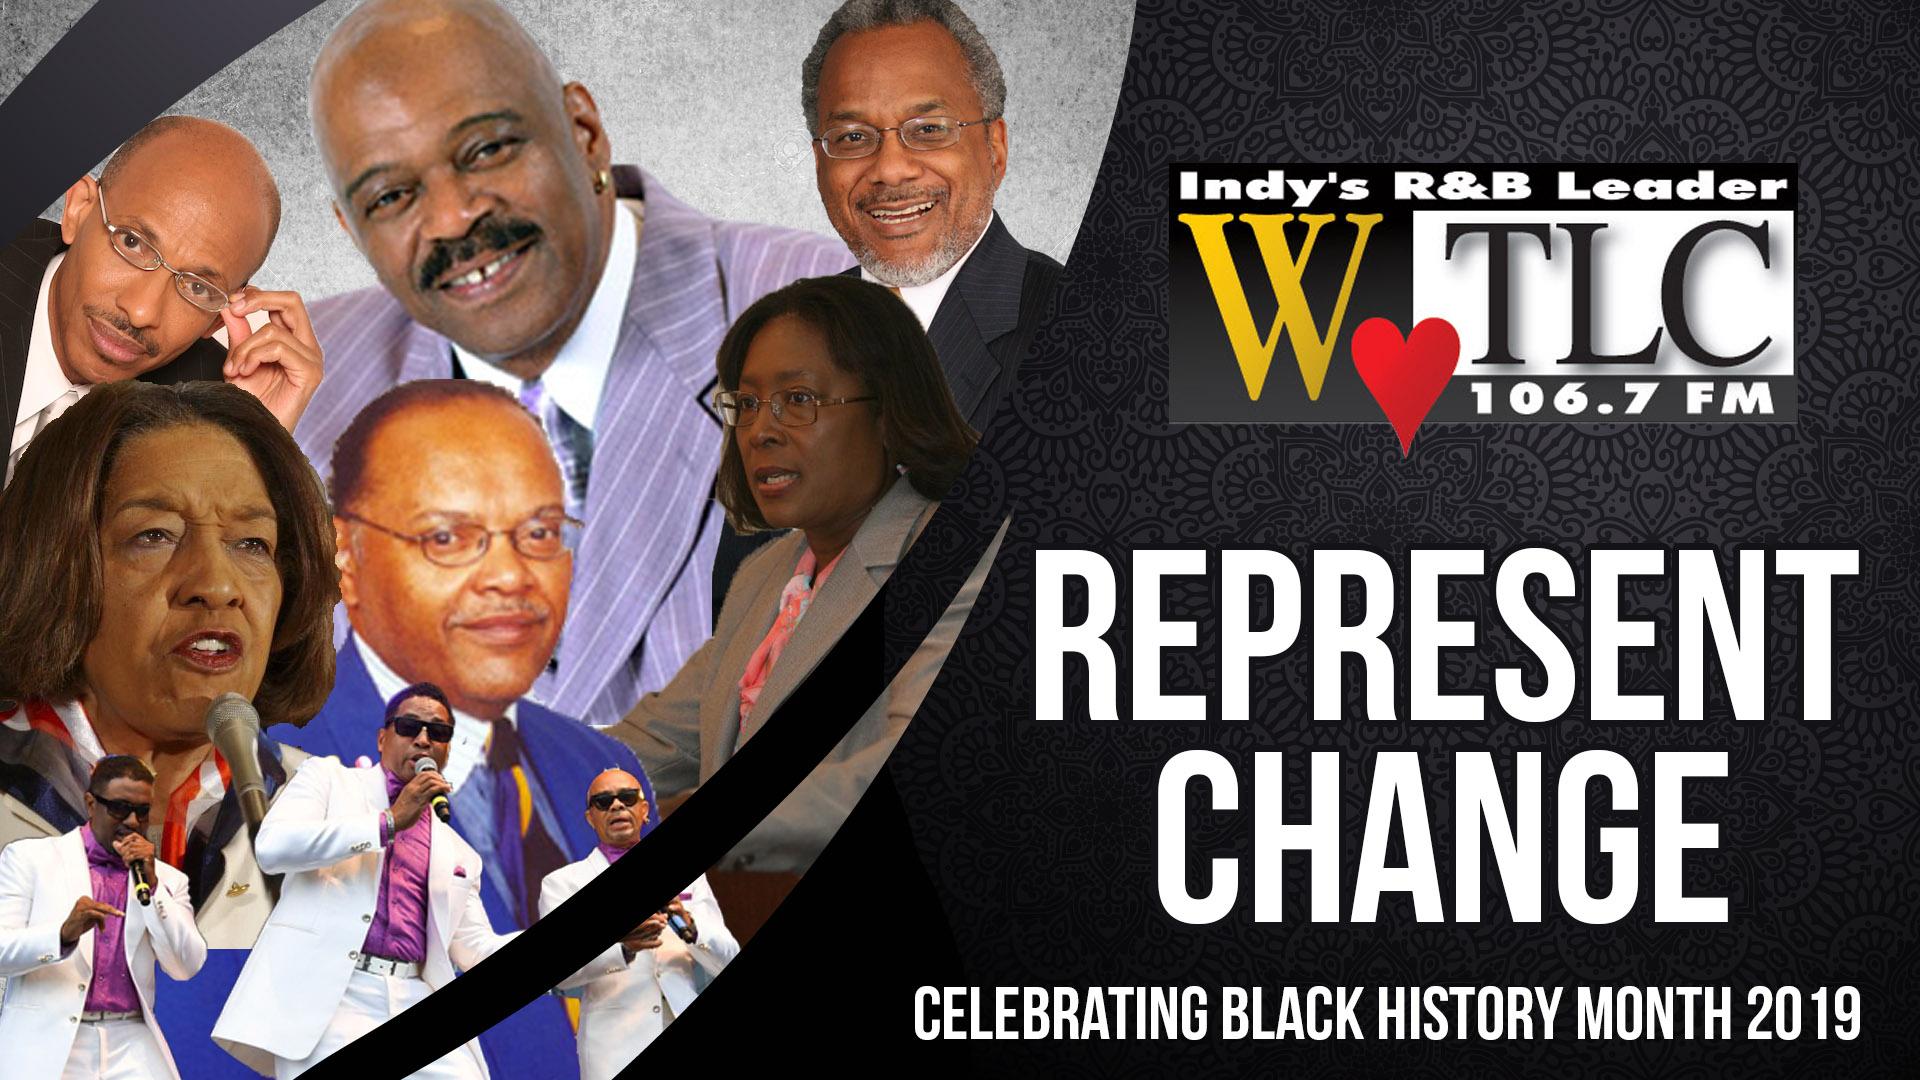 Represent Change: WTLC